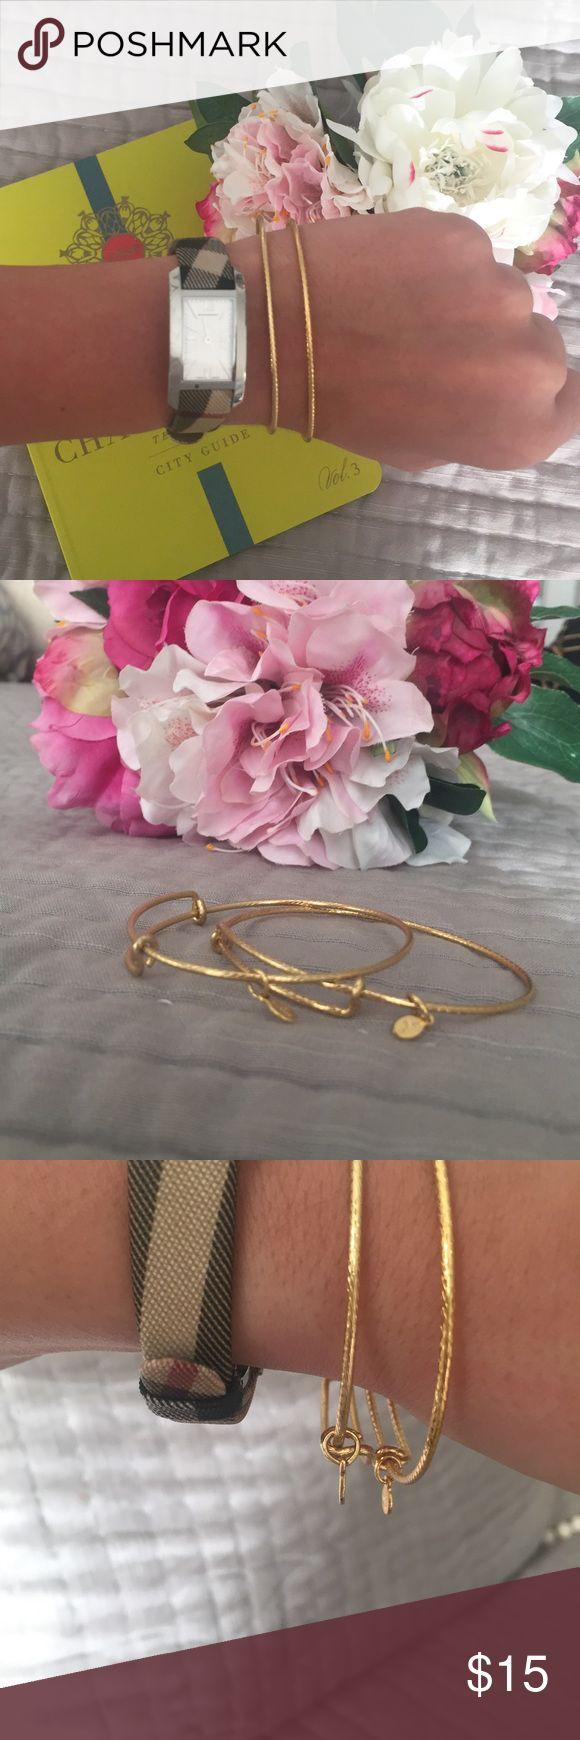 Alex & Ani Bangle Bracelets Dainty Alex & Ani set! Perfect for a fun wrist collection! Alex & Ani Jewelry Bracelets